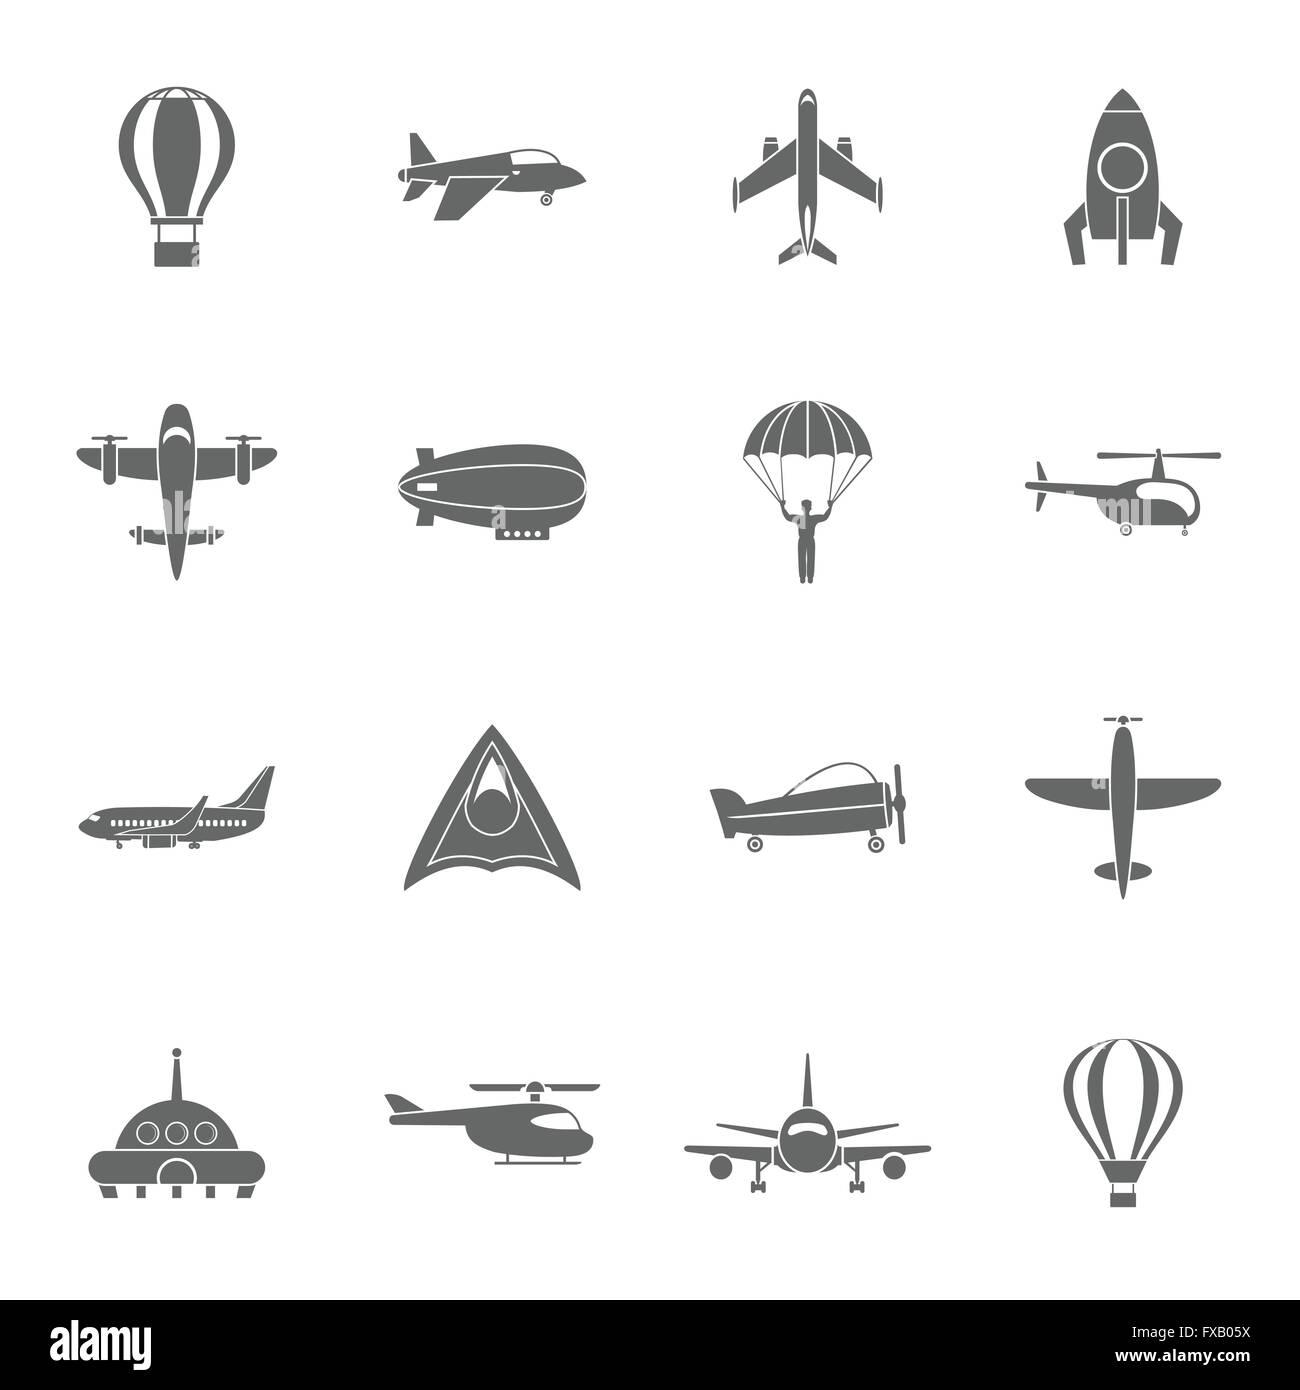 Aircraft icons set black - Stock Image